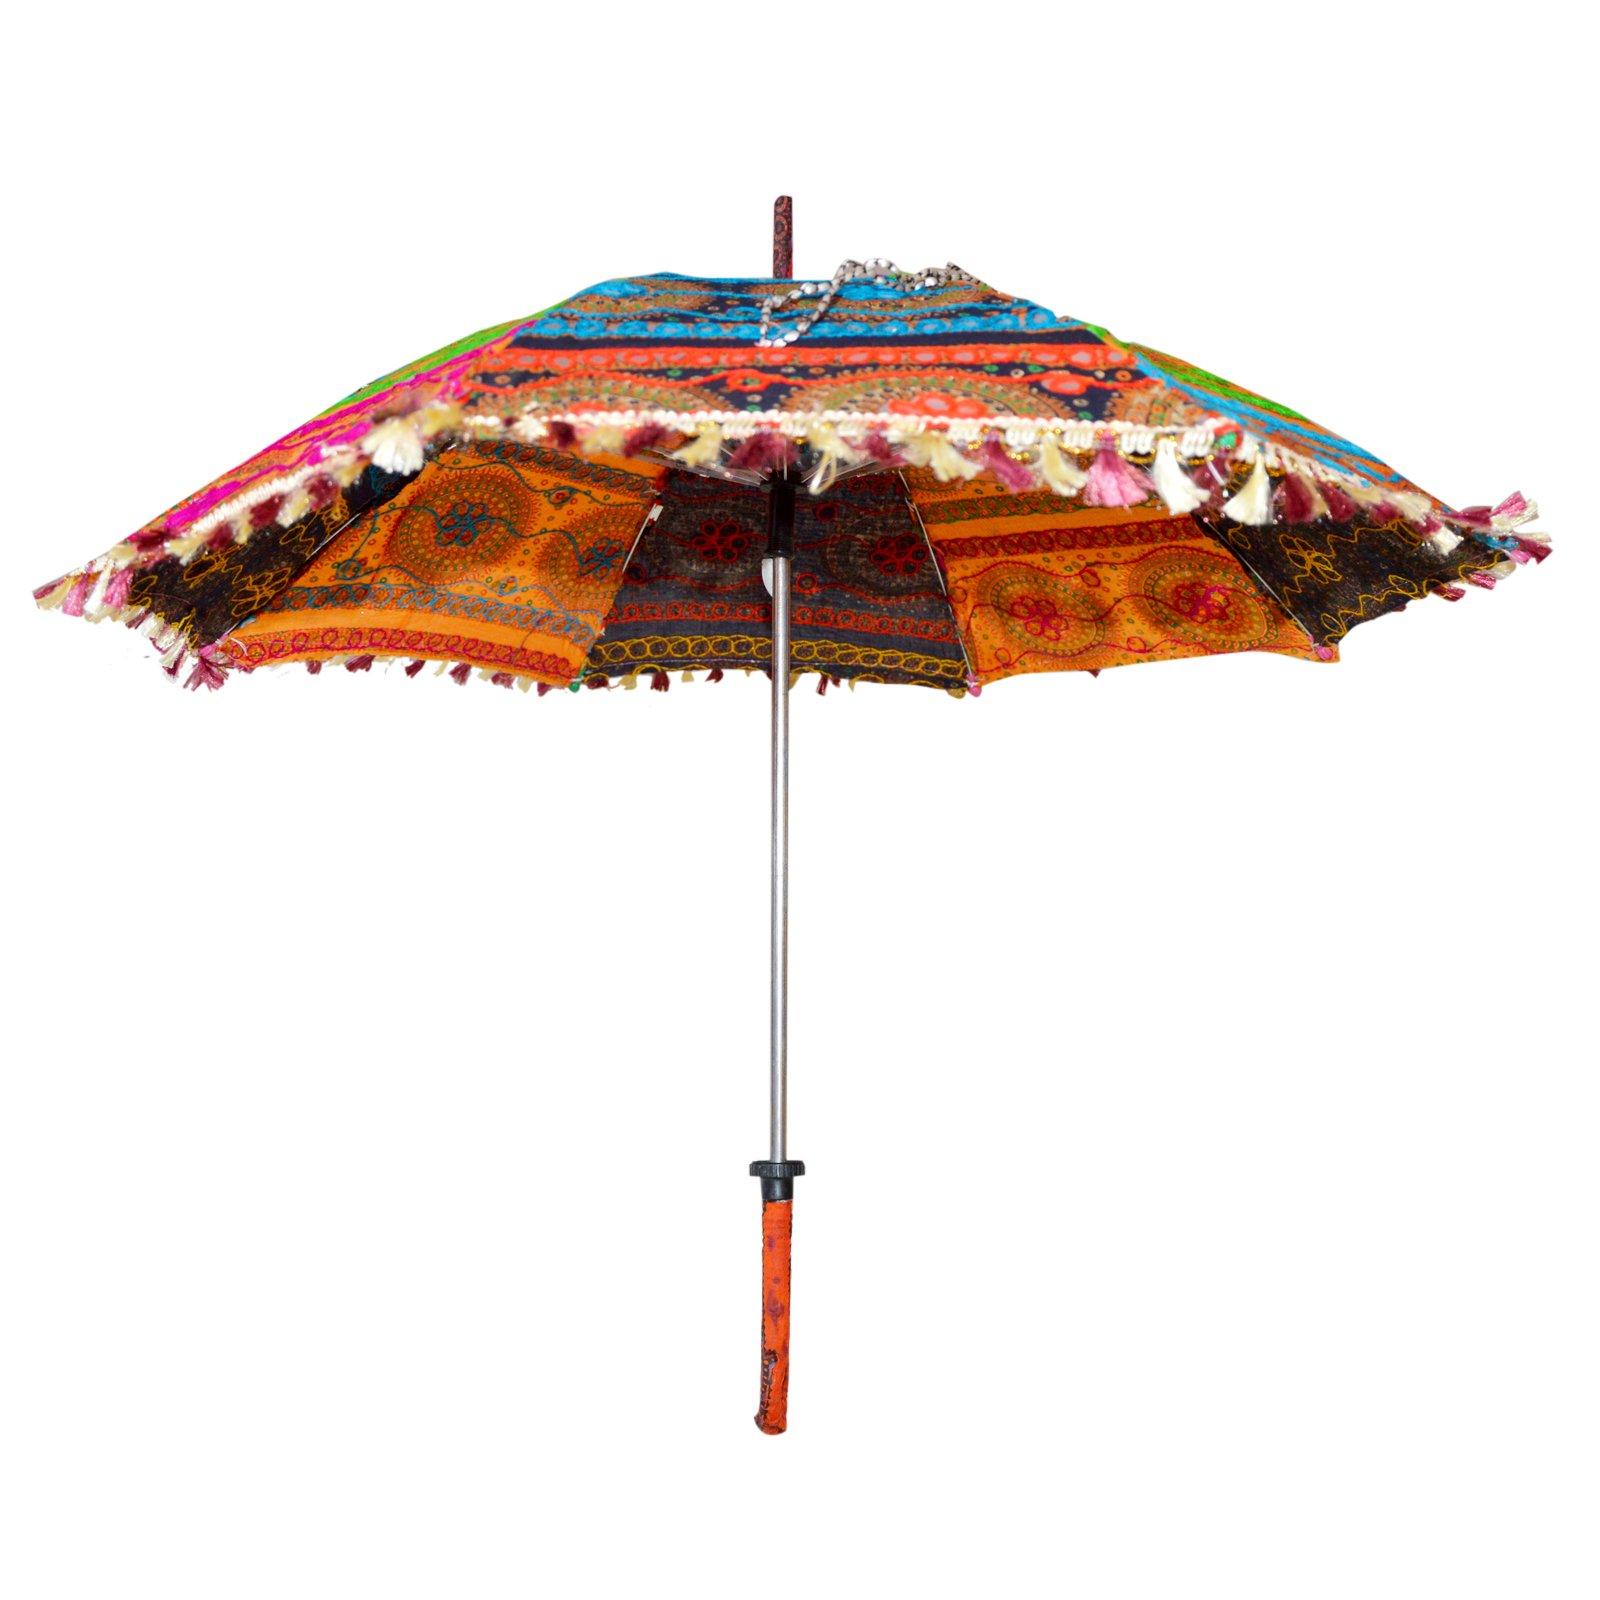 Marusthali Antique Rajasthani Umbrellas Embroidery Designer Cotton Umbrella by Marusthali (Image #2)